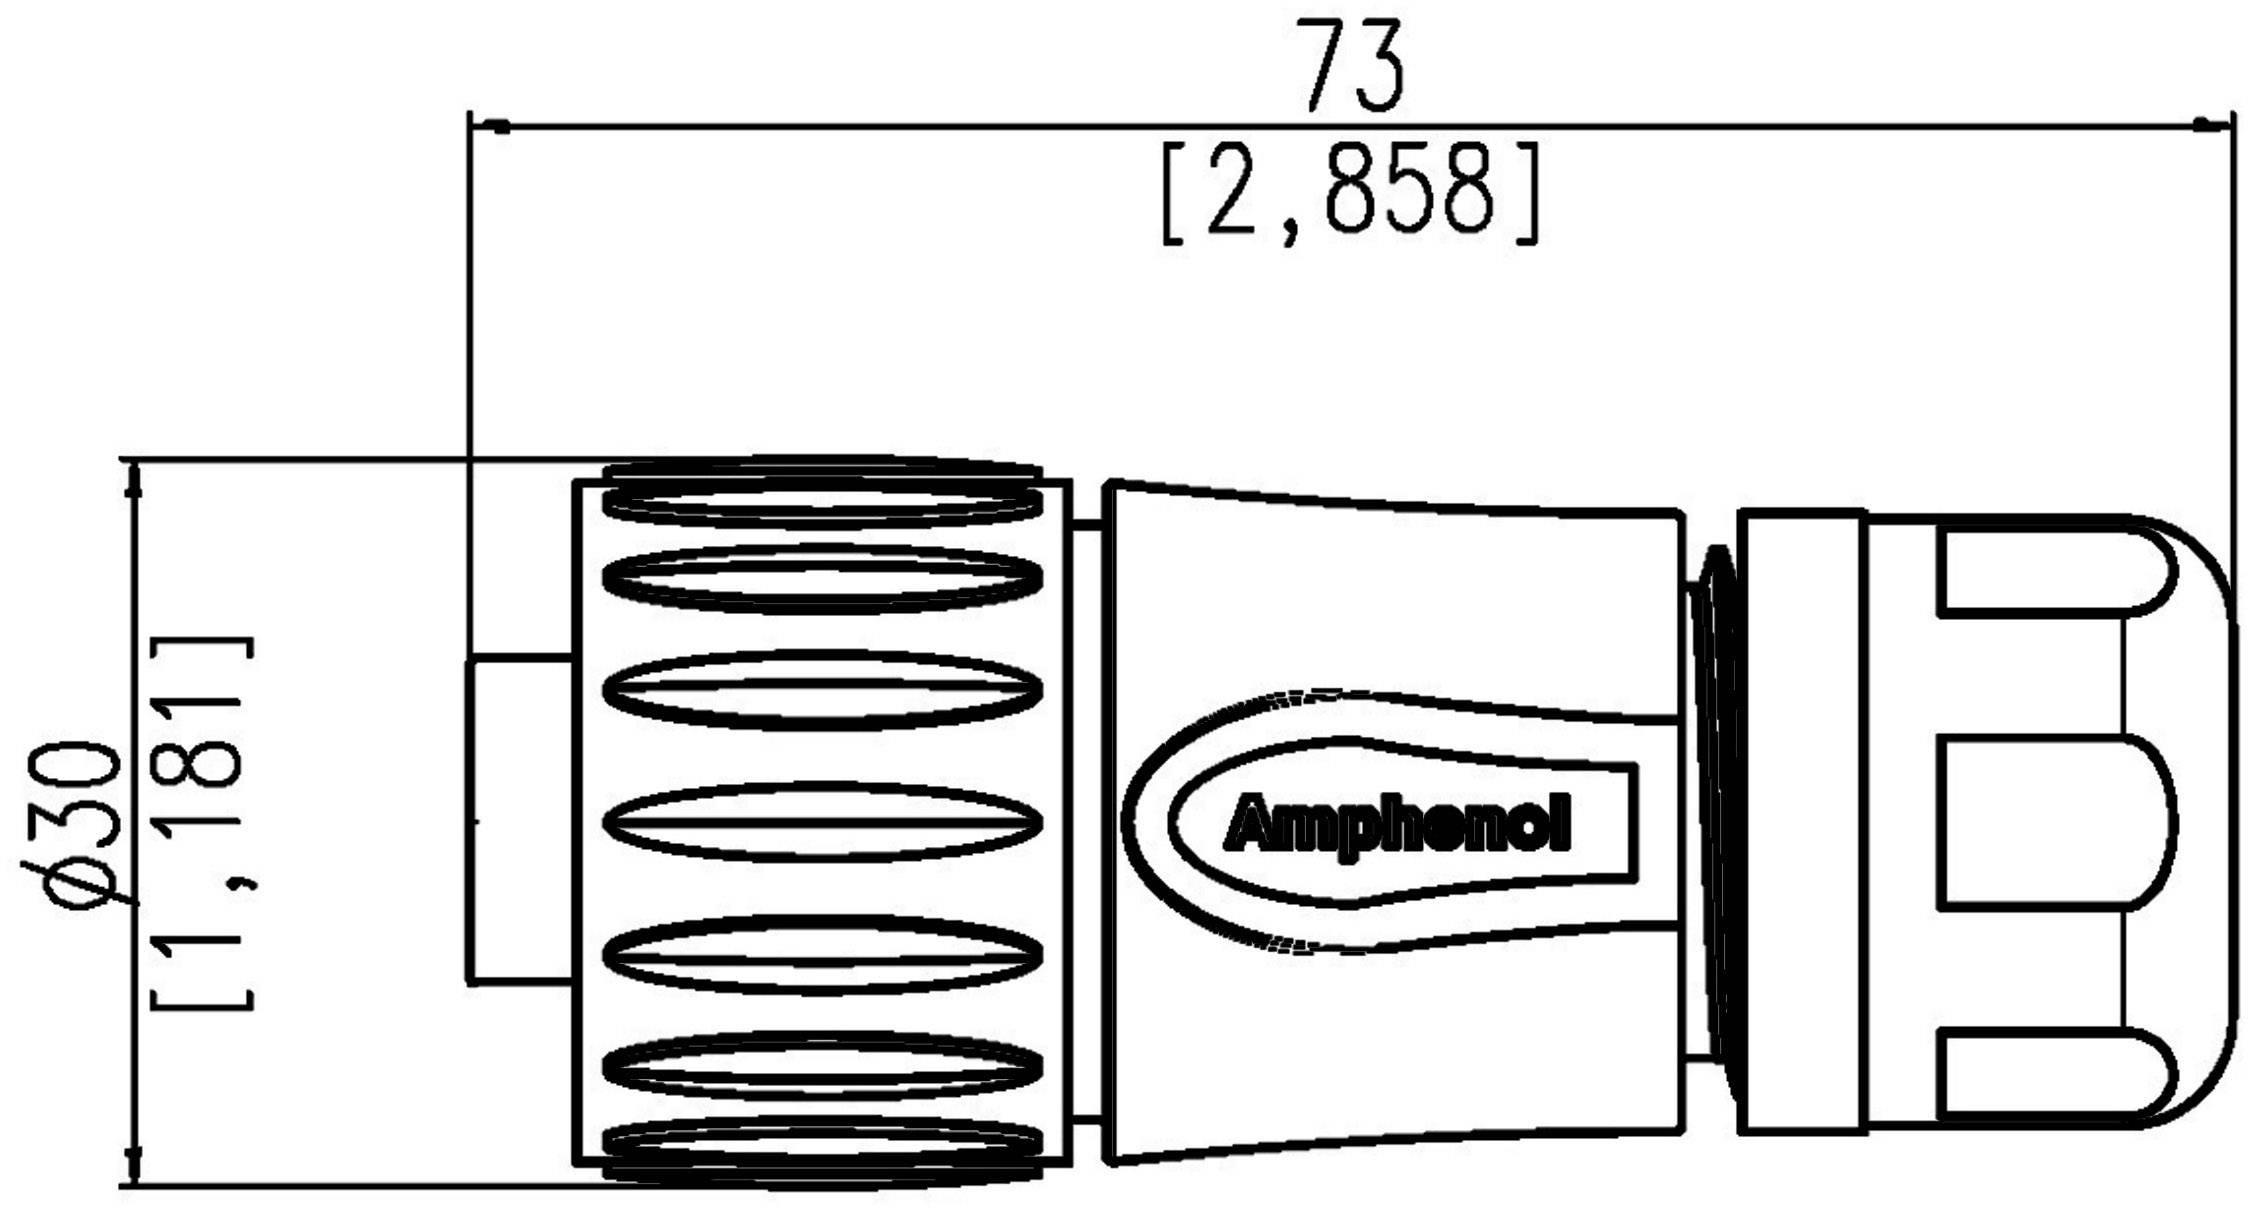 Amphenol C016 30D006 110 10 IP67 (v zablokovanom stave), polyamid 6.6, pólů + PE, 1 ks